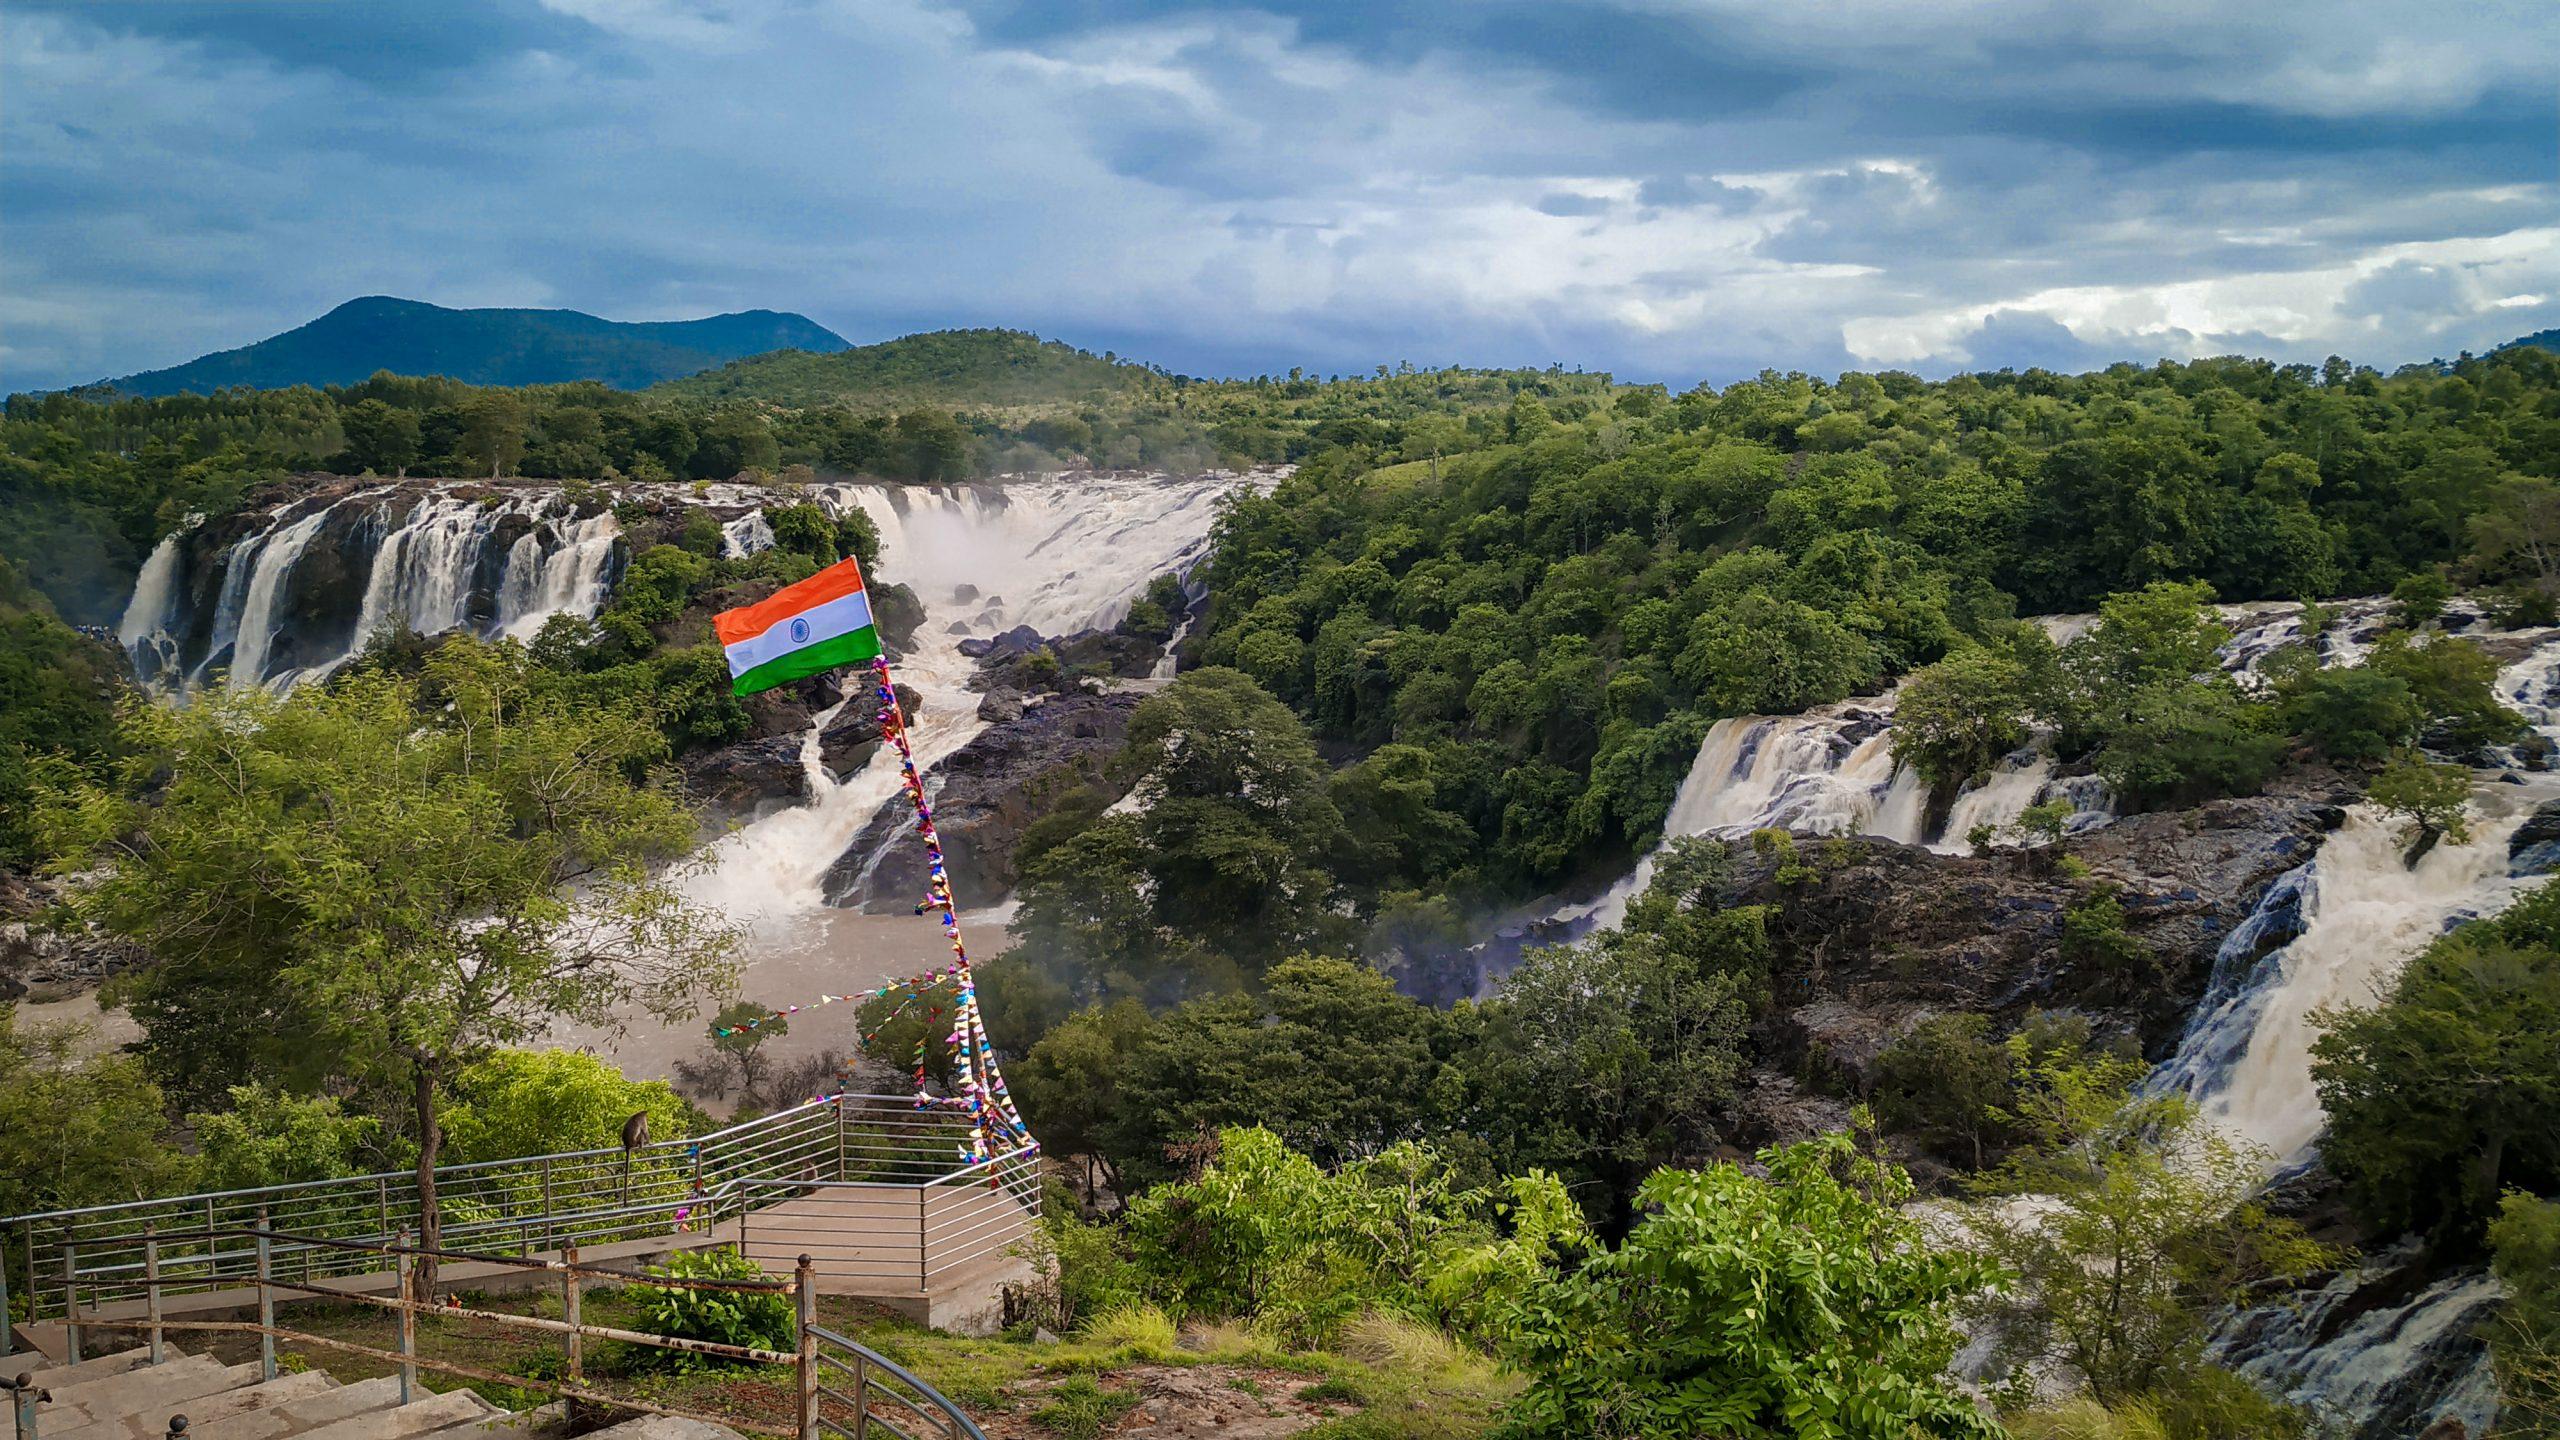 Shivasamudram Falls Scenery